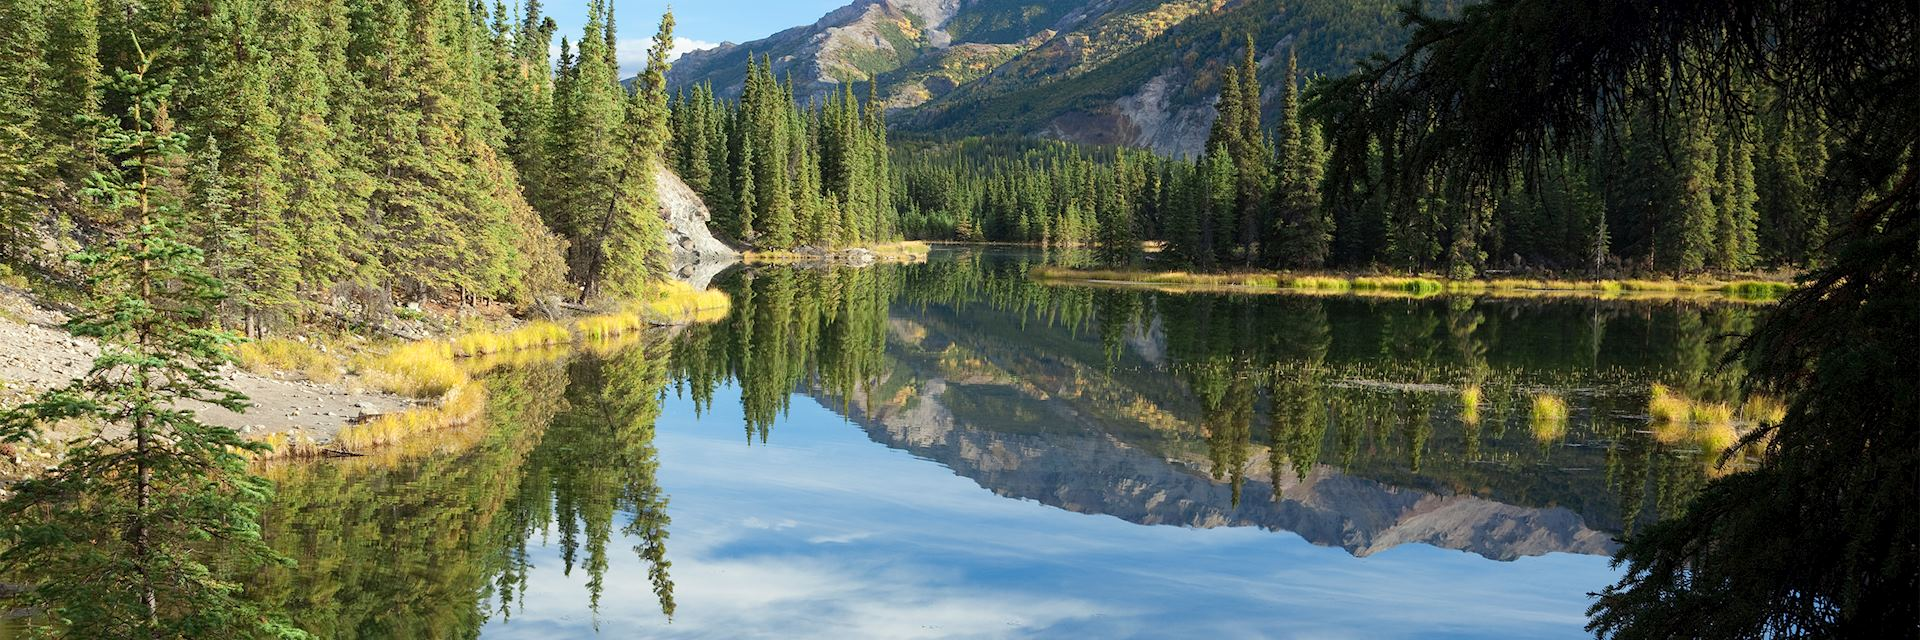 Horseshoe Lake, Denali National Park